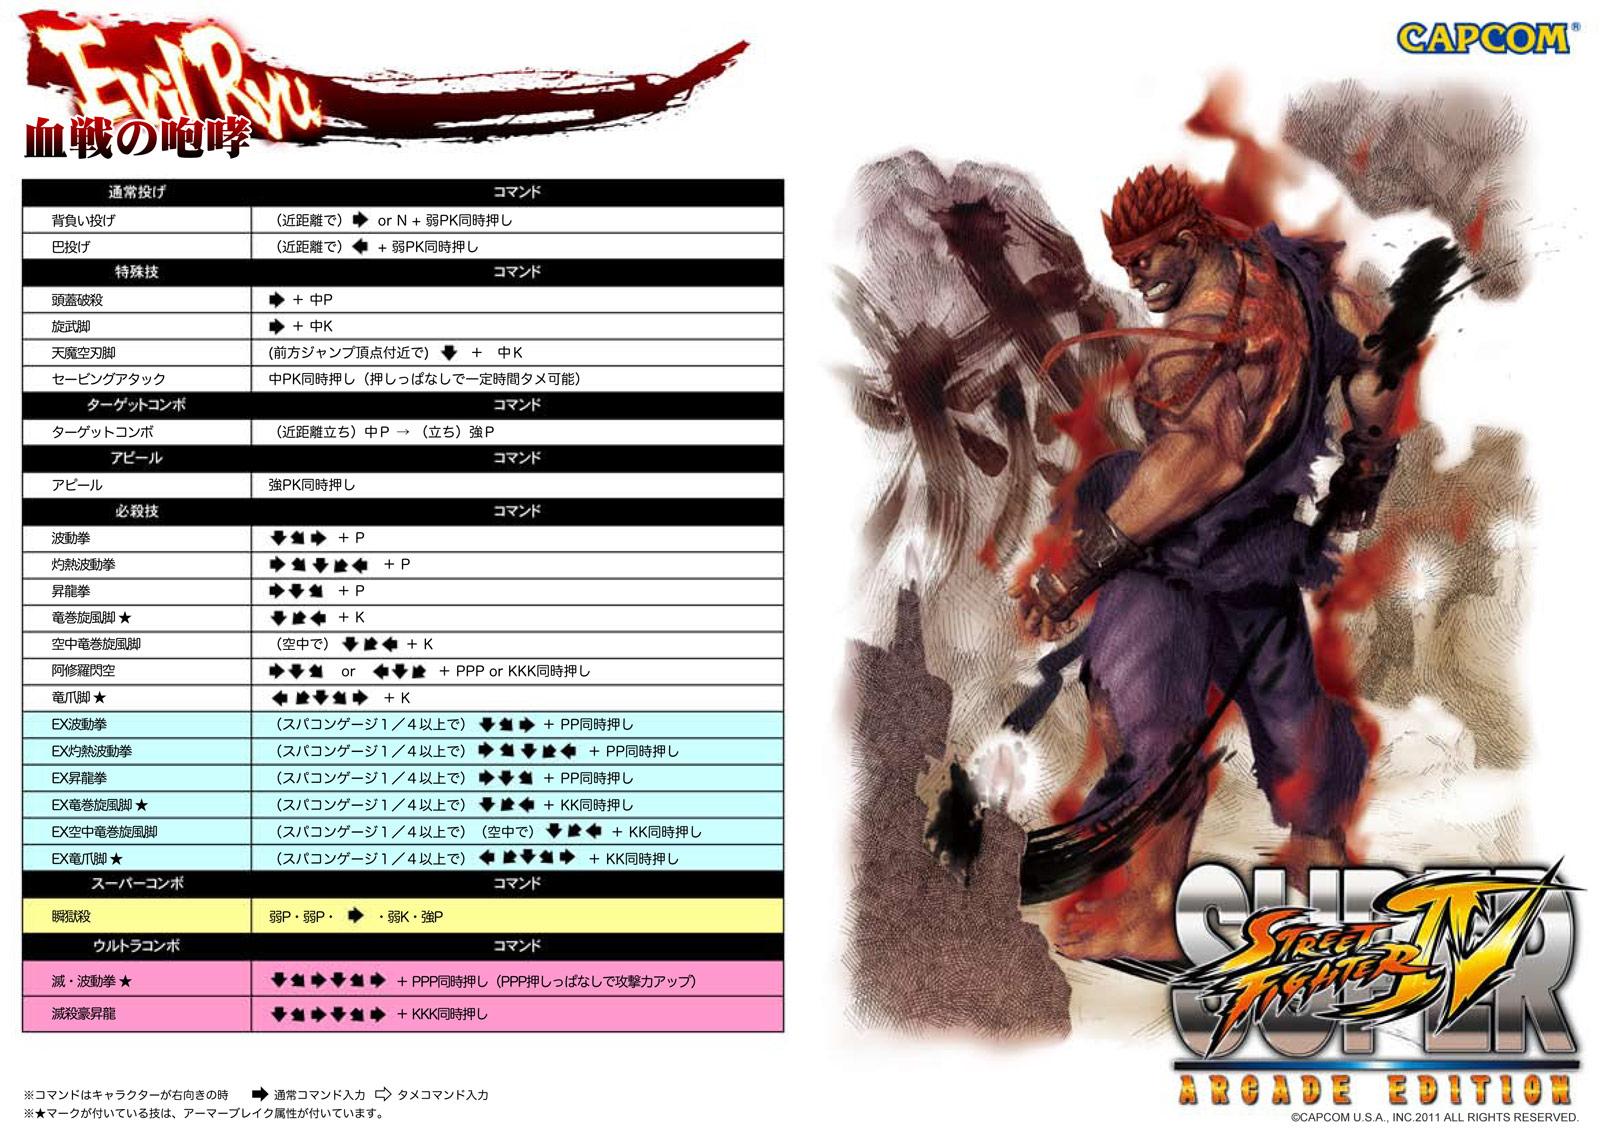 Evil Ryu S Move Set In Super Street Fighter 4 Arcade Edition